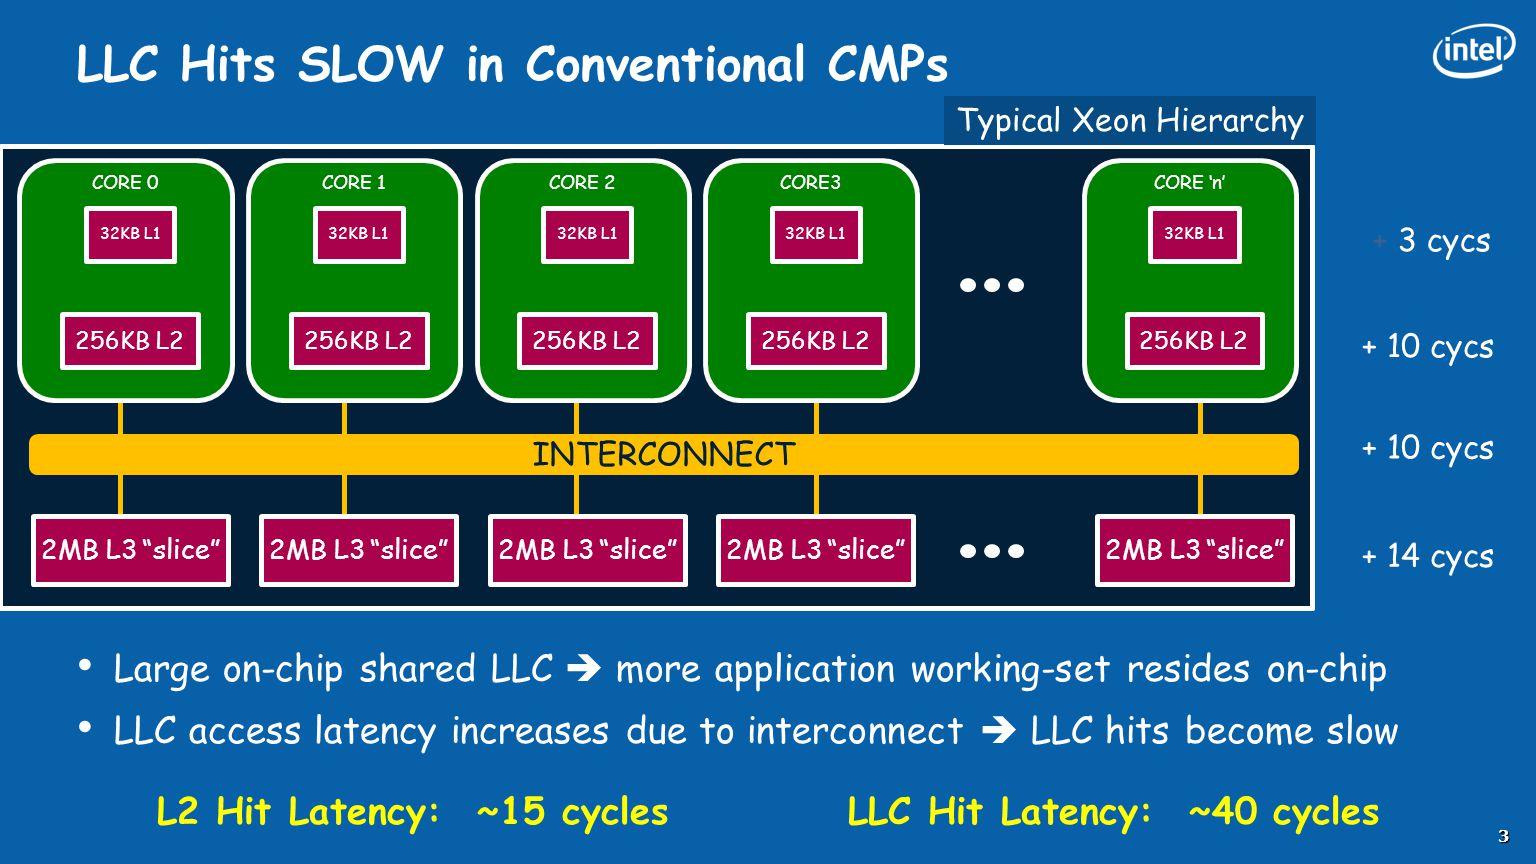 "LLC Hits SLOW in Conventional CMPs INTERCONNECT 3 CORE 0 32KB L1 256KB L2 2MB L3 ""slice"" + 3 cycs + 10 cycs + 14 cycs + 10 cycs Typical Xeon Hierarchy"